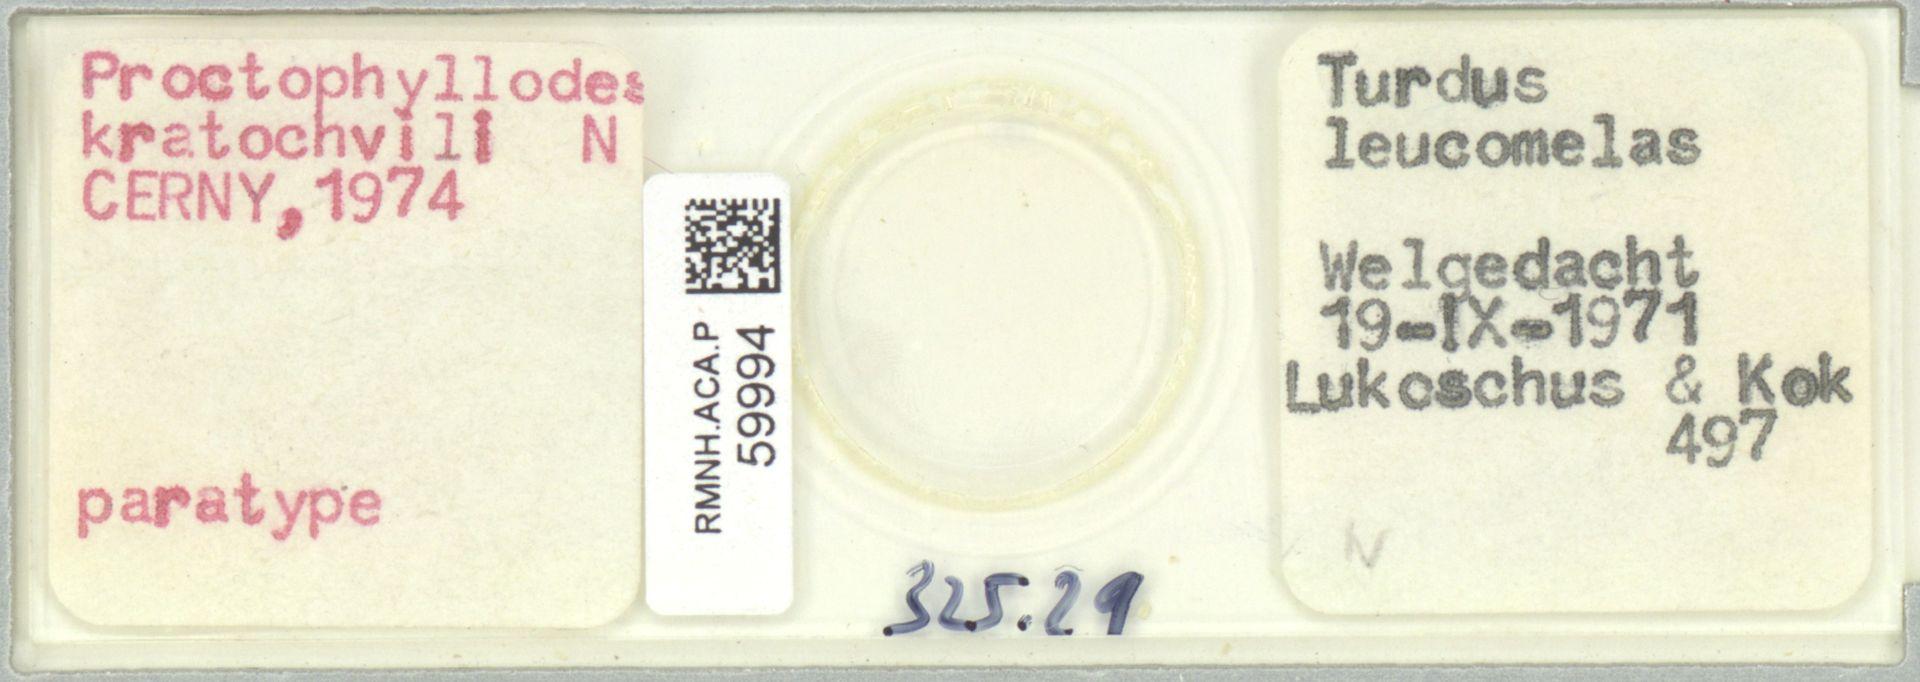 RMNH.ACA.P.59994 | Proctophyllodes kratochvili Cerny, 1974